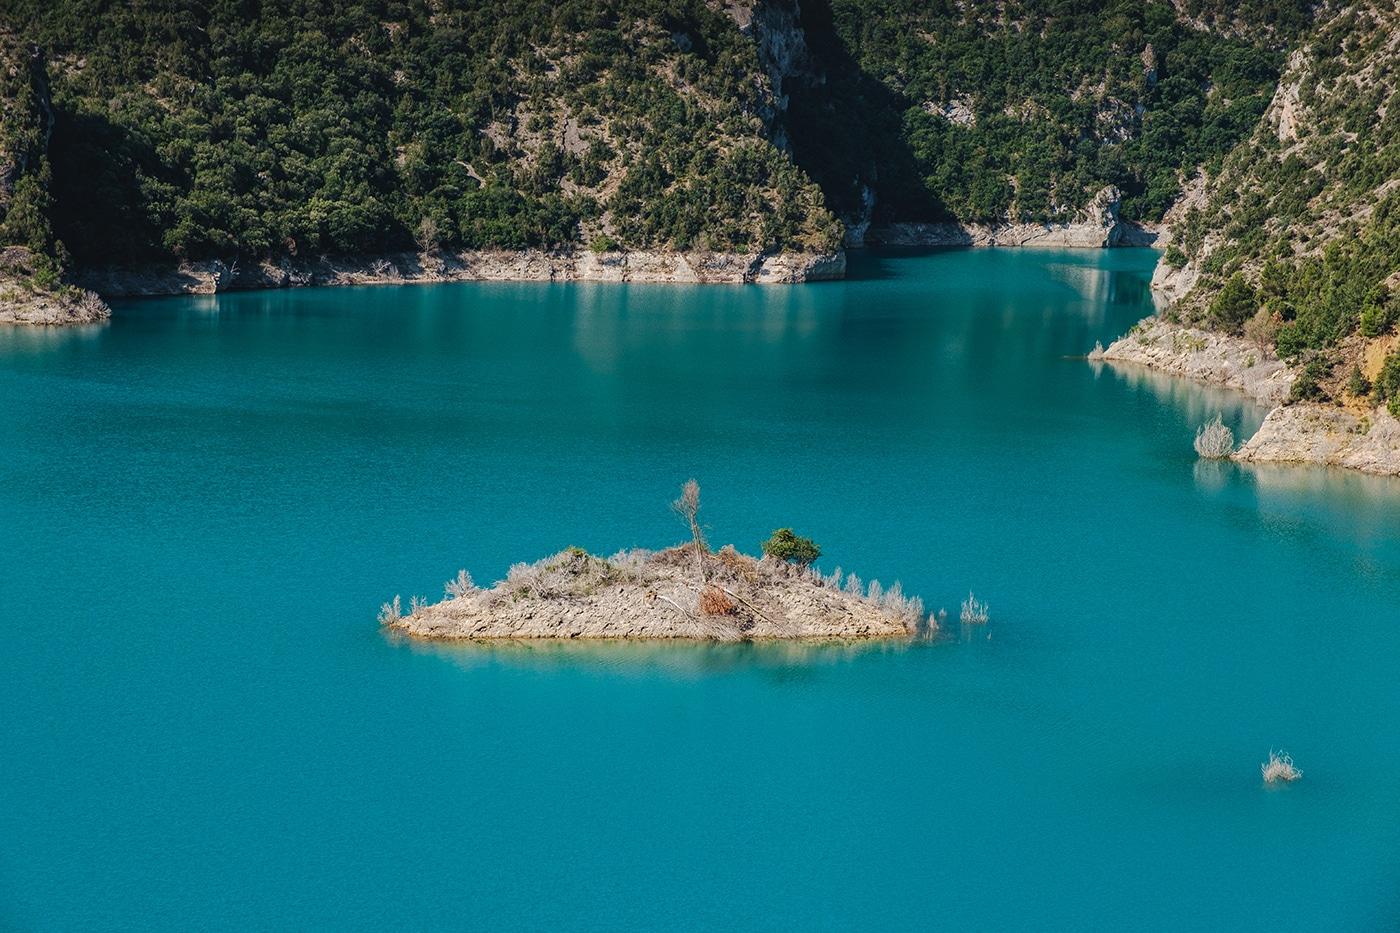 Randonnée muraille de Finestras Espagne blog de voyage